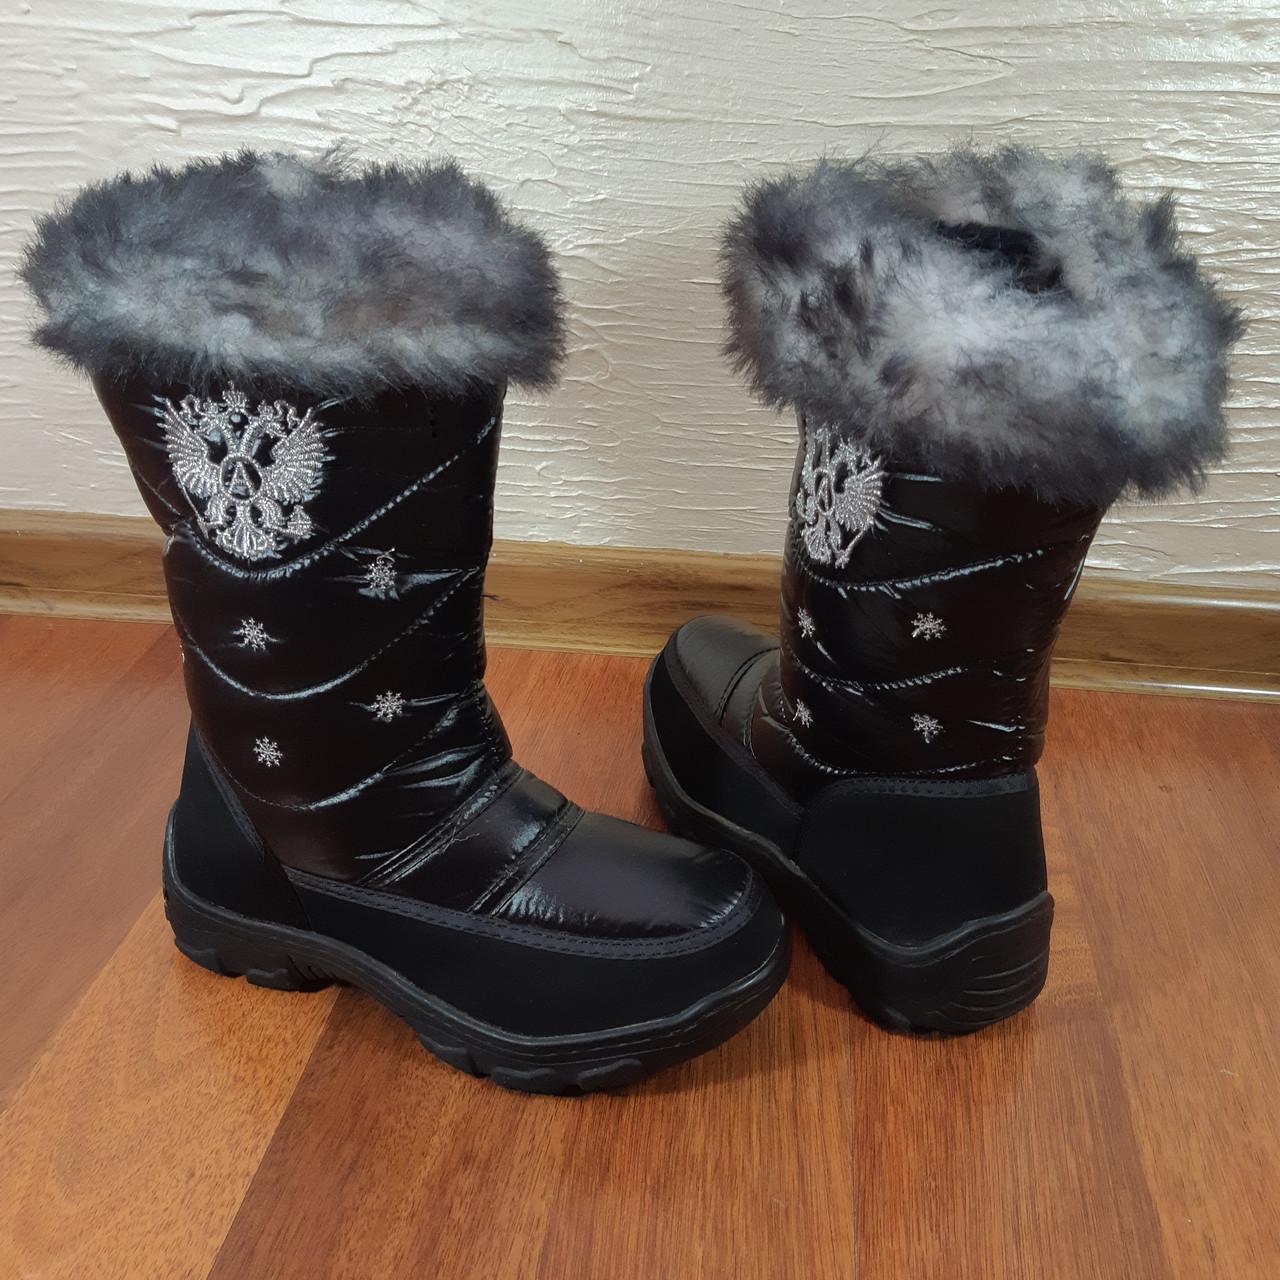 6a14086f0 Дутики зимние Black R10, цена 300 грн., купить в Черновцах — Prom.ua ...